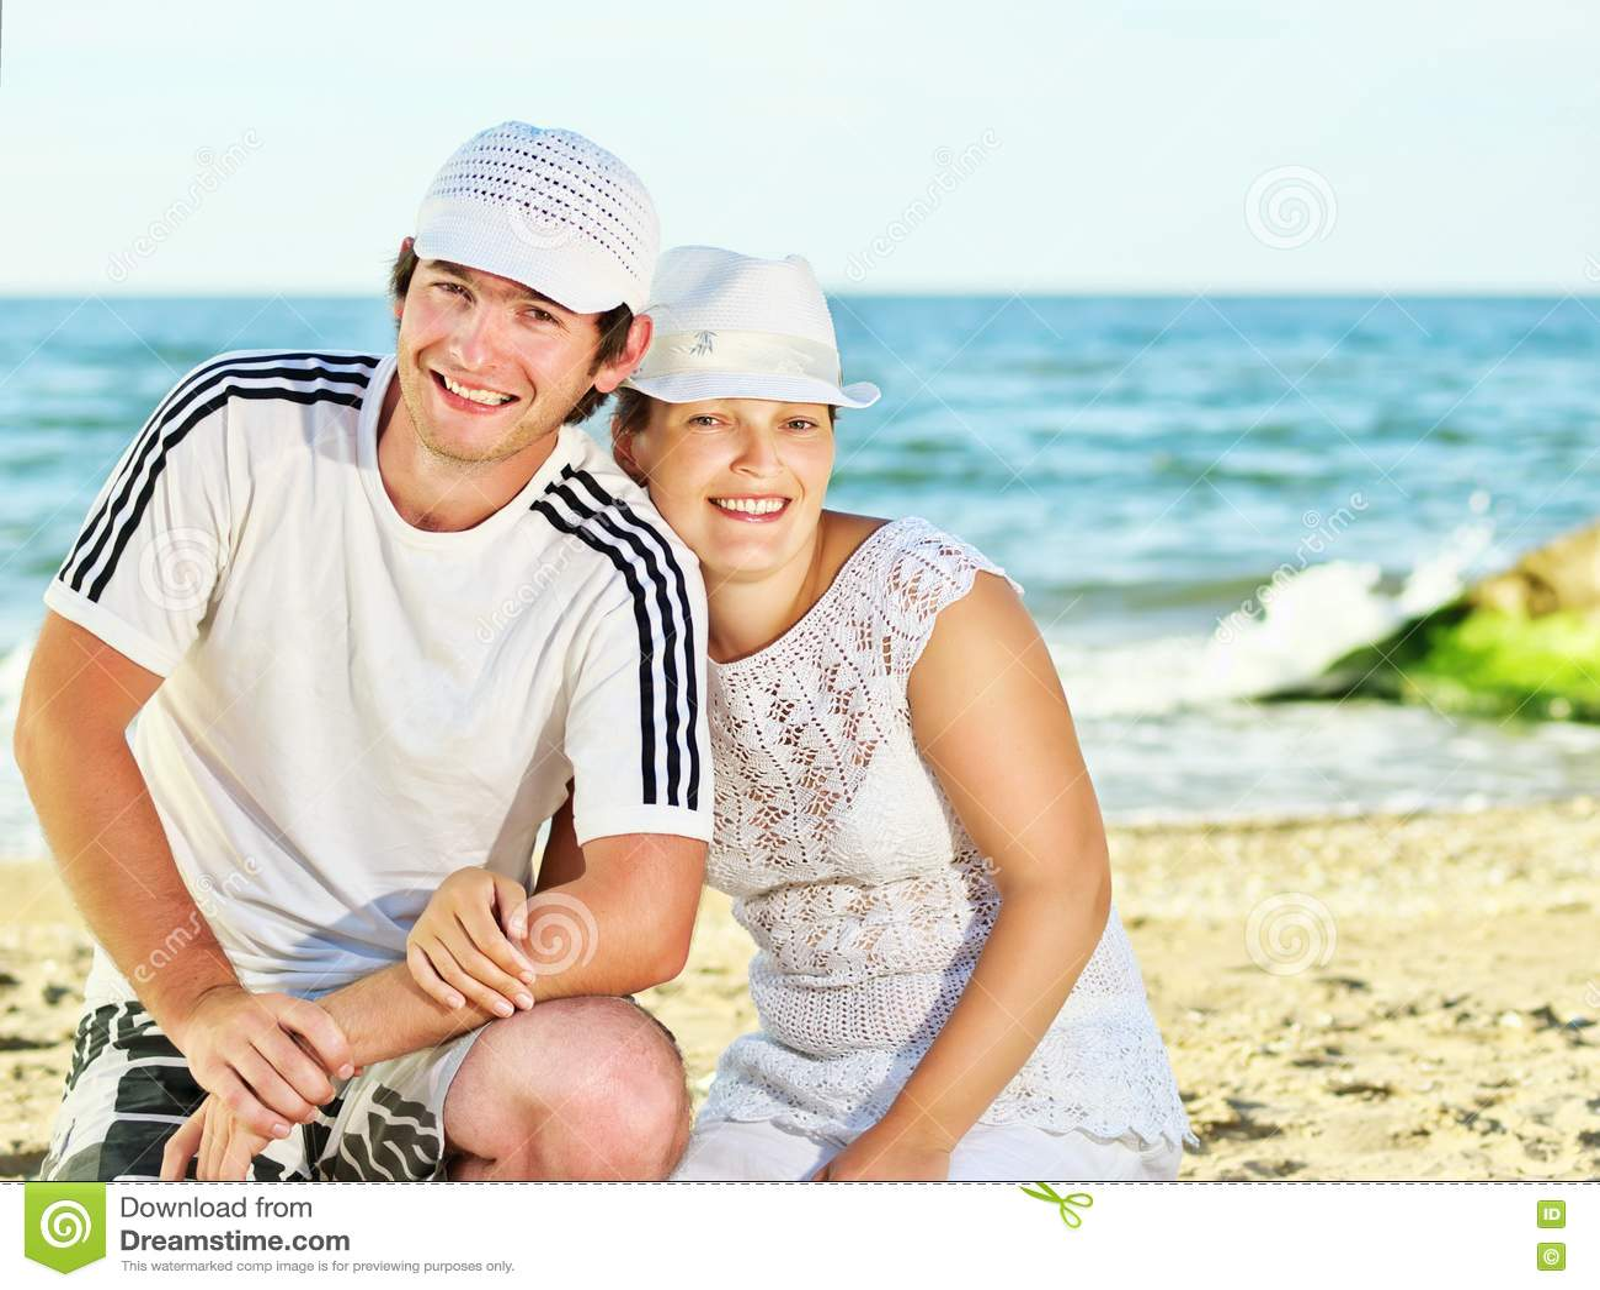 https://thumbs.dreamstime.com/z/happy-couple-sea-beach-14276420.jpg